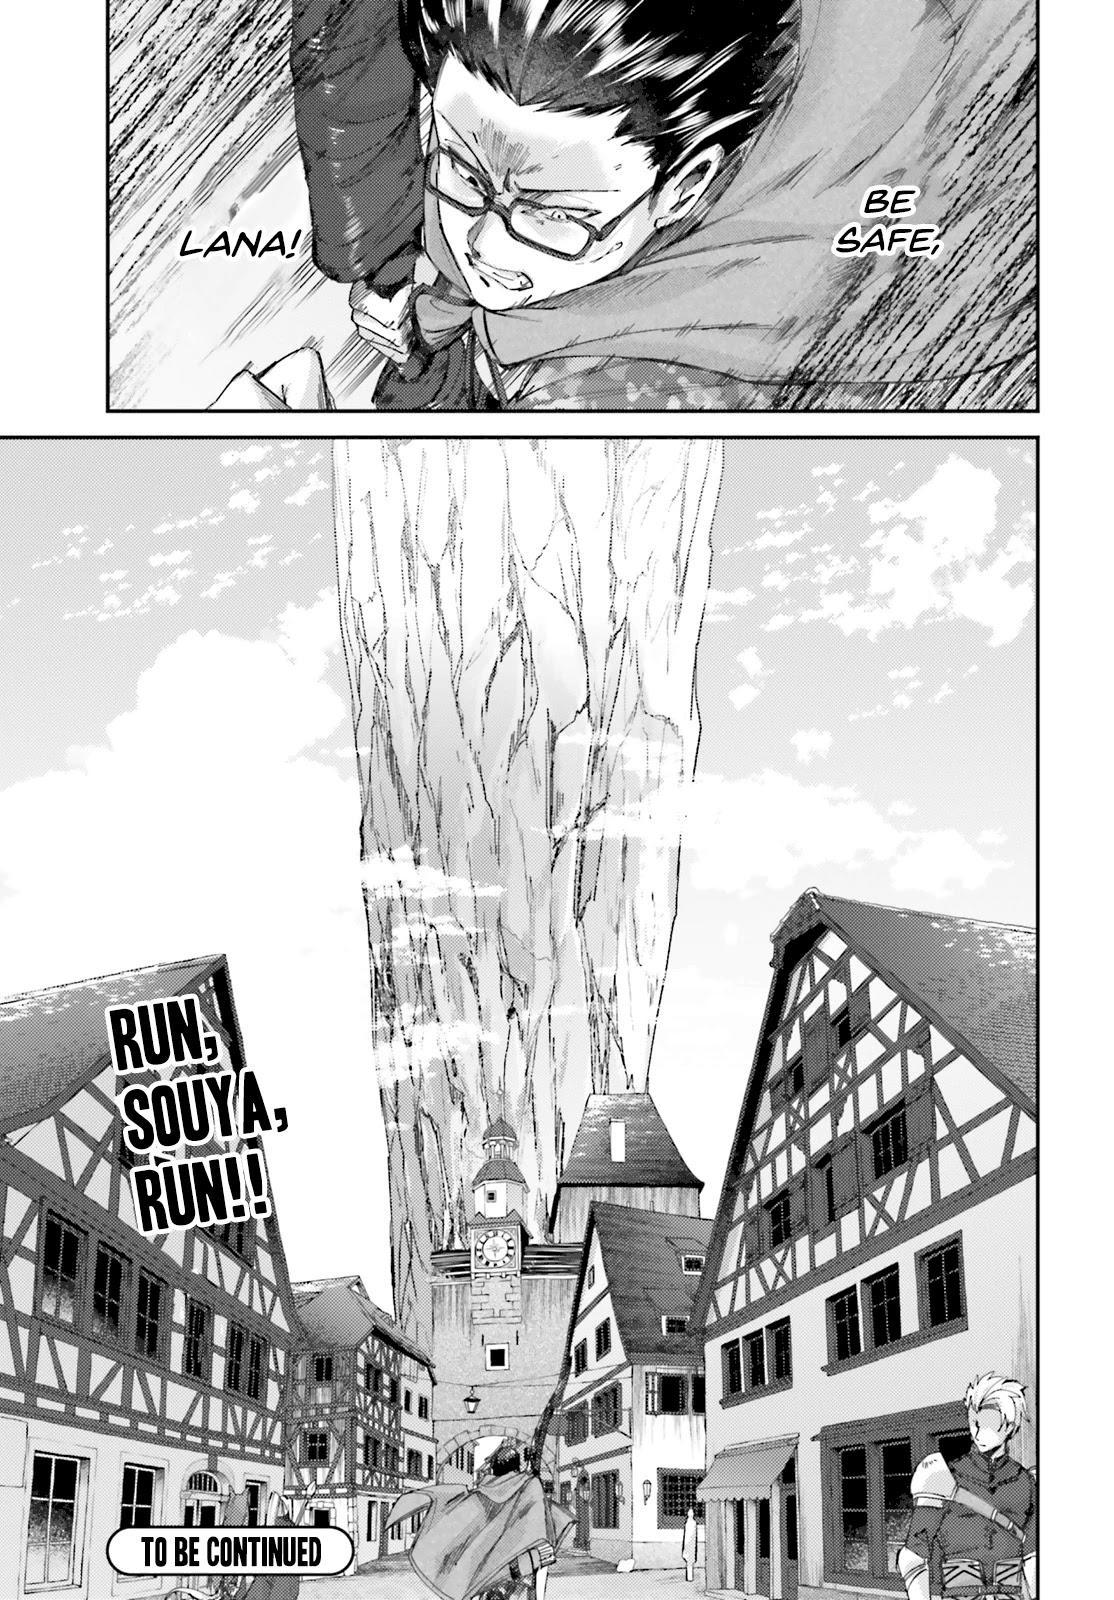 Ihoujin, Dungeon Ni Moguru Chapter 9: The Shadow Asks Your Heart page 30 - Mangakakalots.com